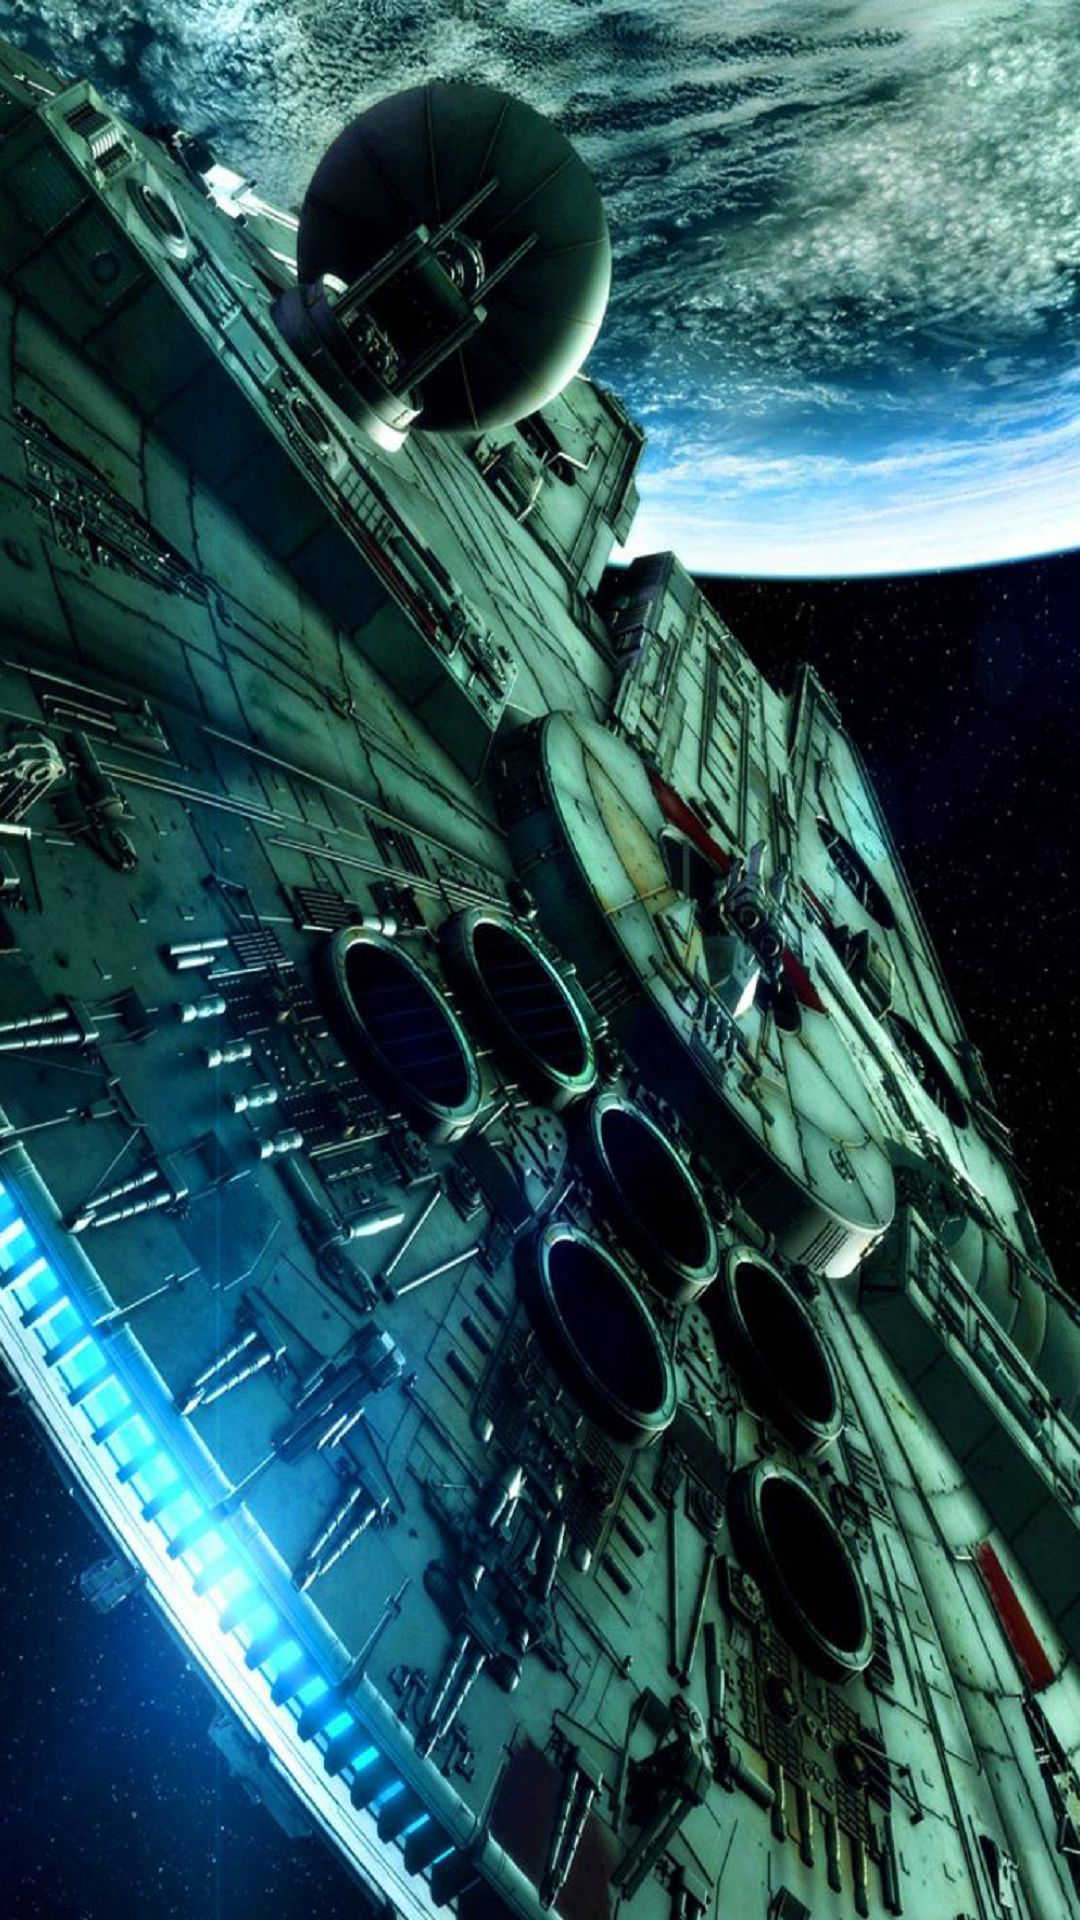 Star Wars Spaceship 3Wallpapers iPhone Parallax Star Wars Spaceship